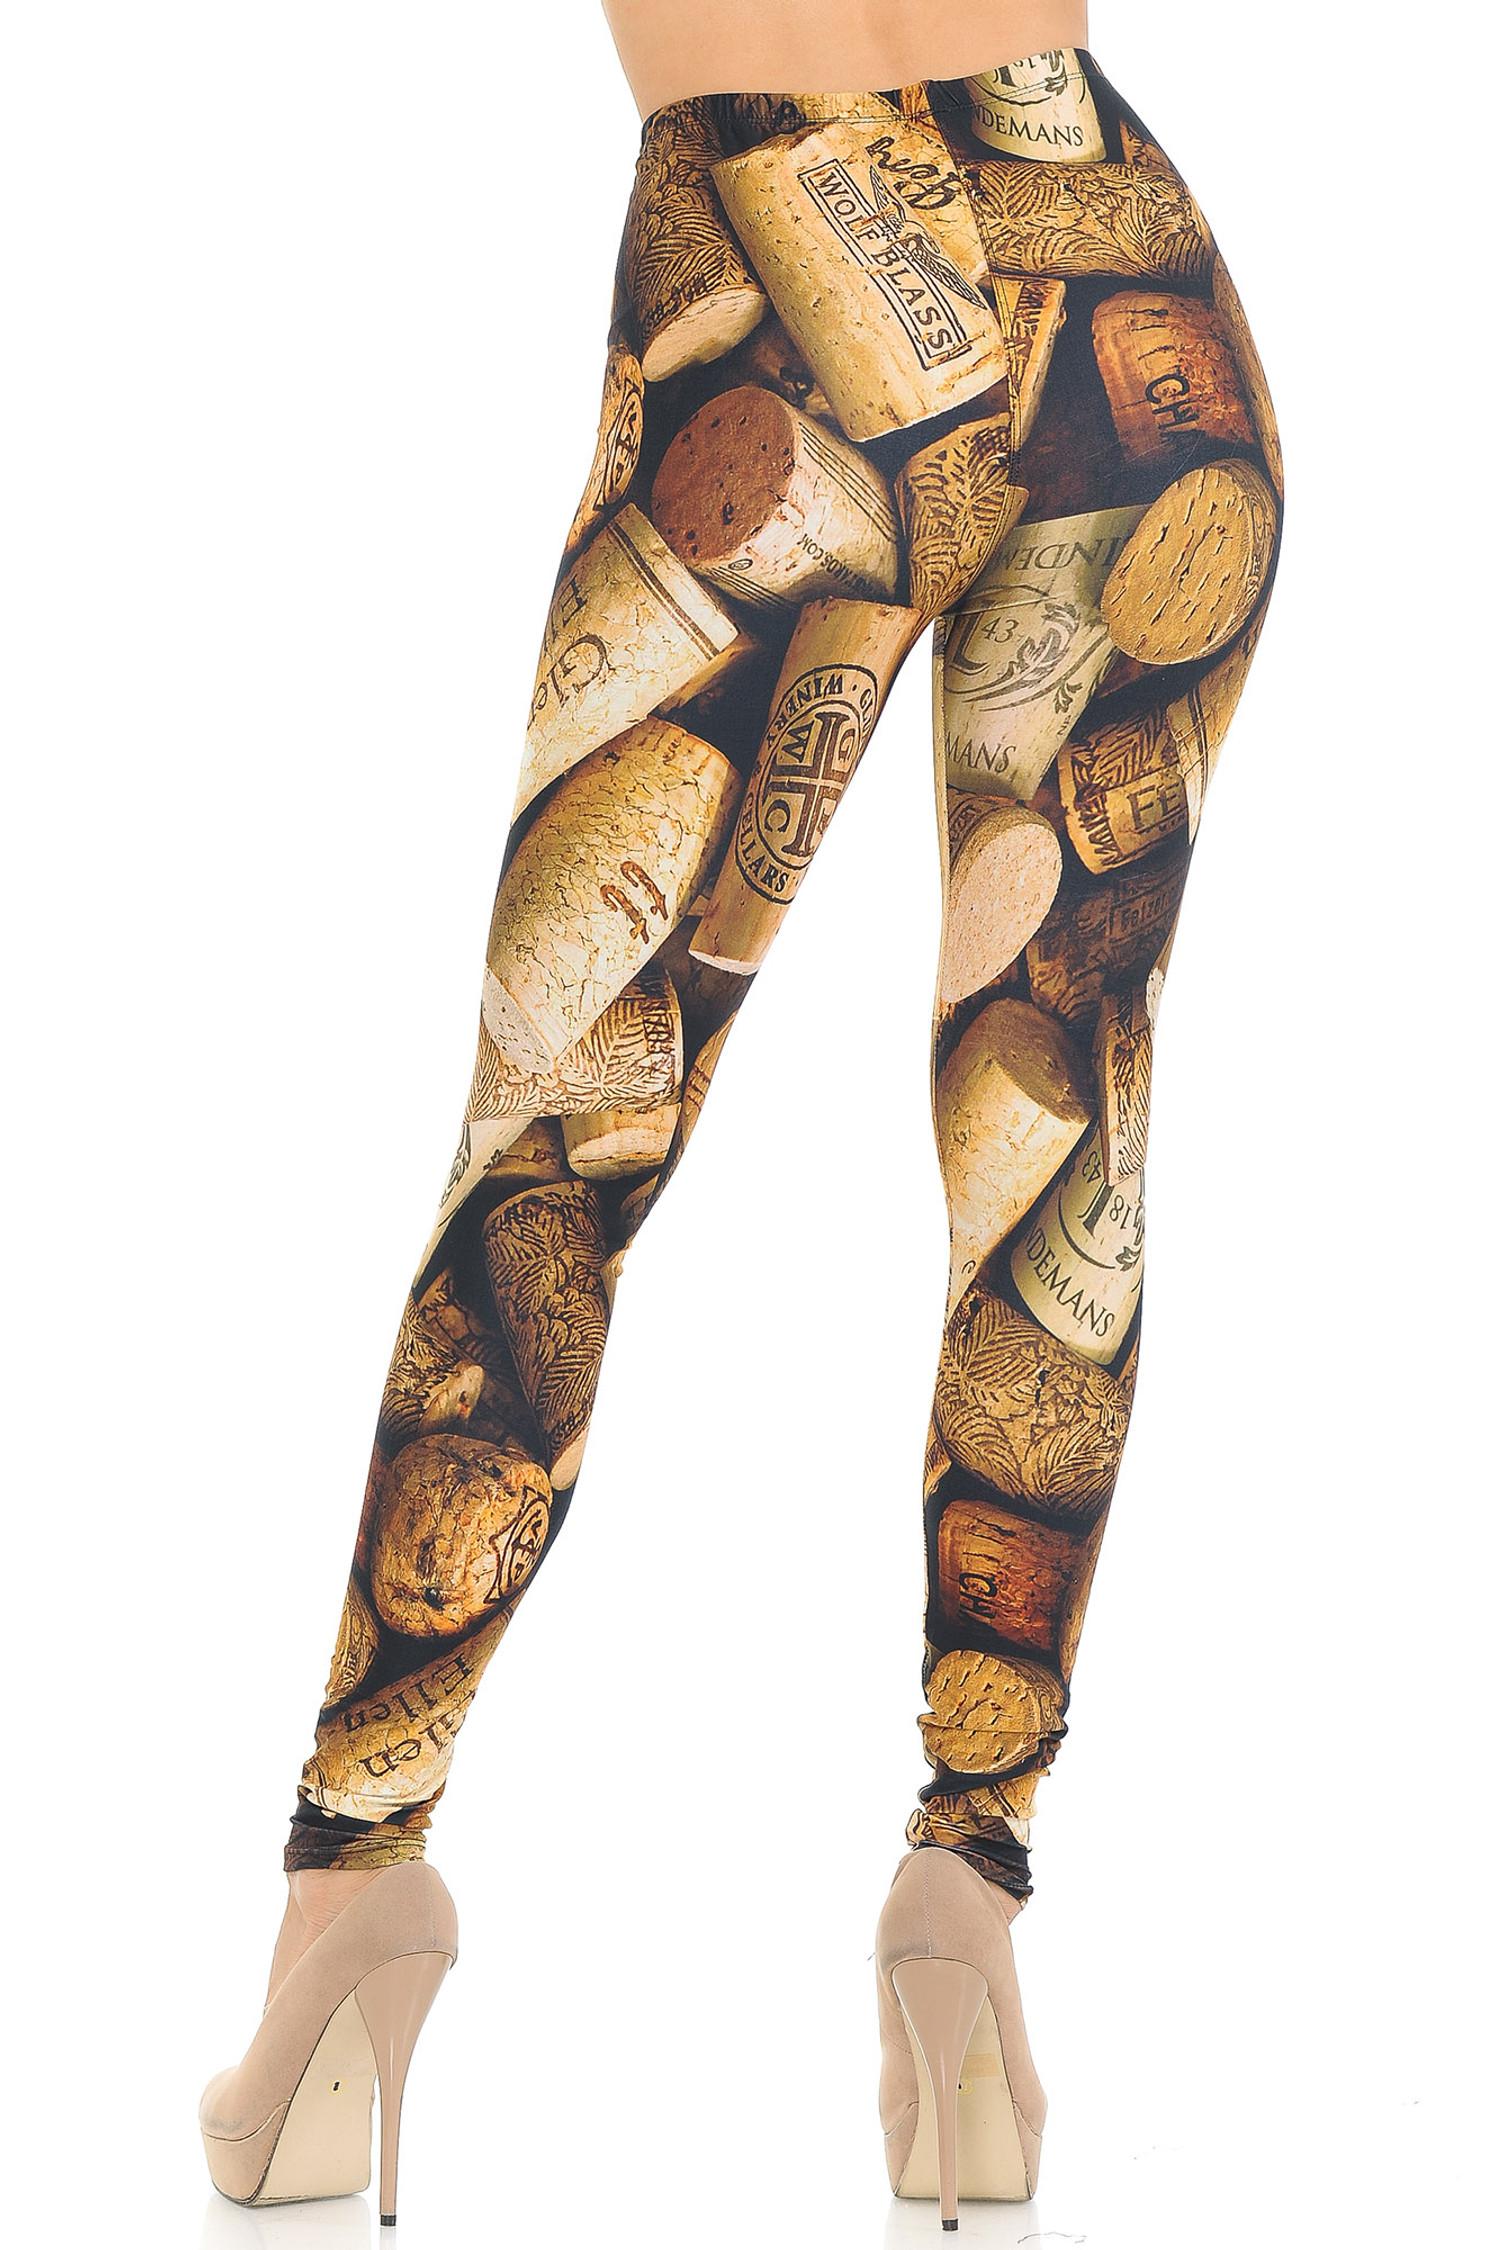 Creamy Soft Wine Cork Leggings - USA Fashion™